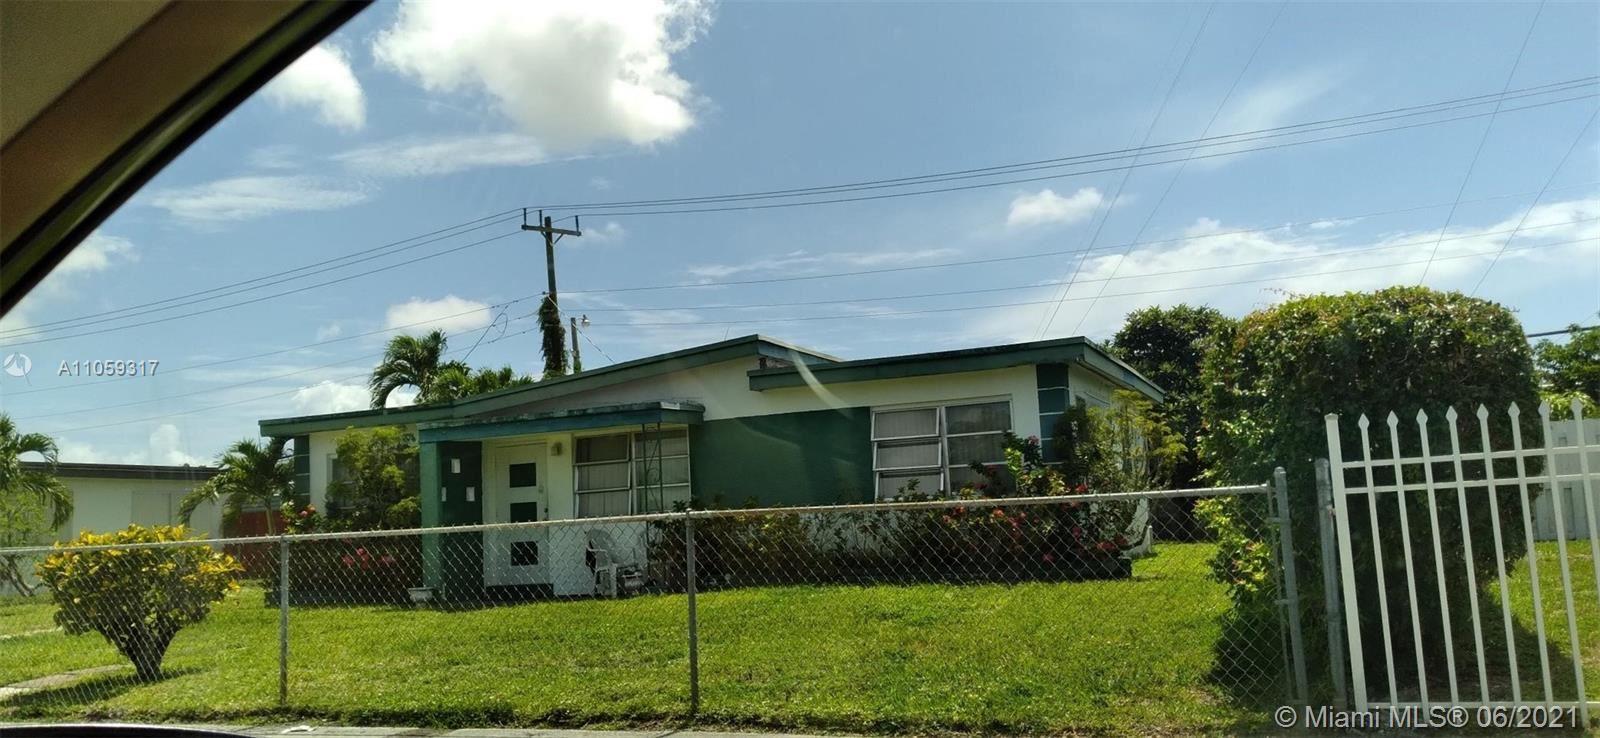 2551 SW 53rd Ave, West Park, FL 33023 - #: A11059317